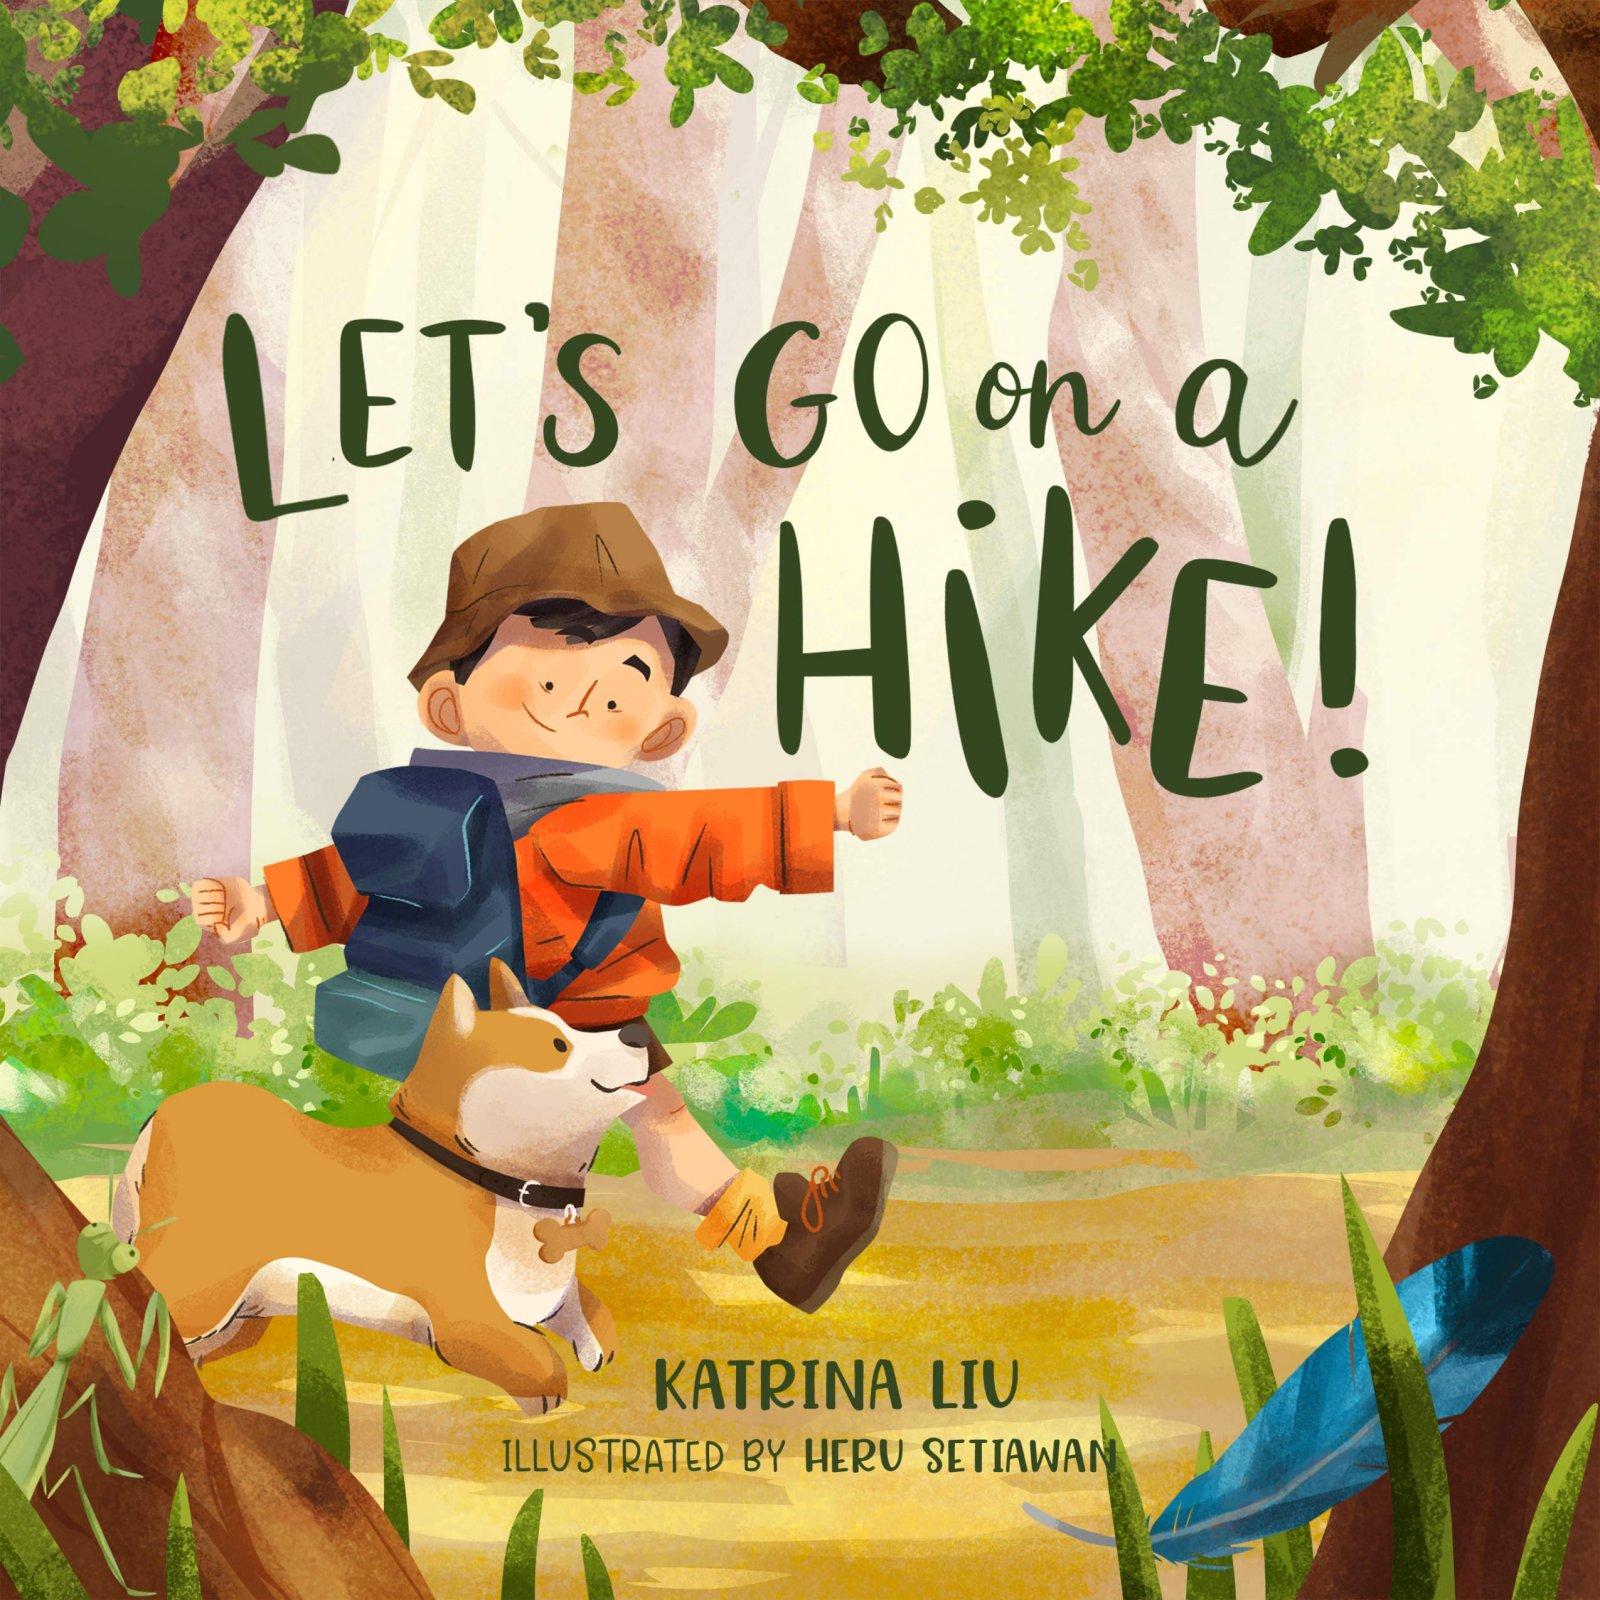 Let's Go On A Hike by Katrina Liu